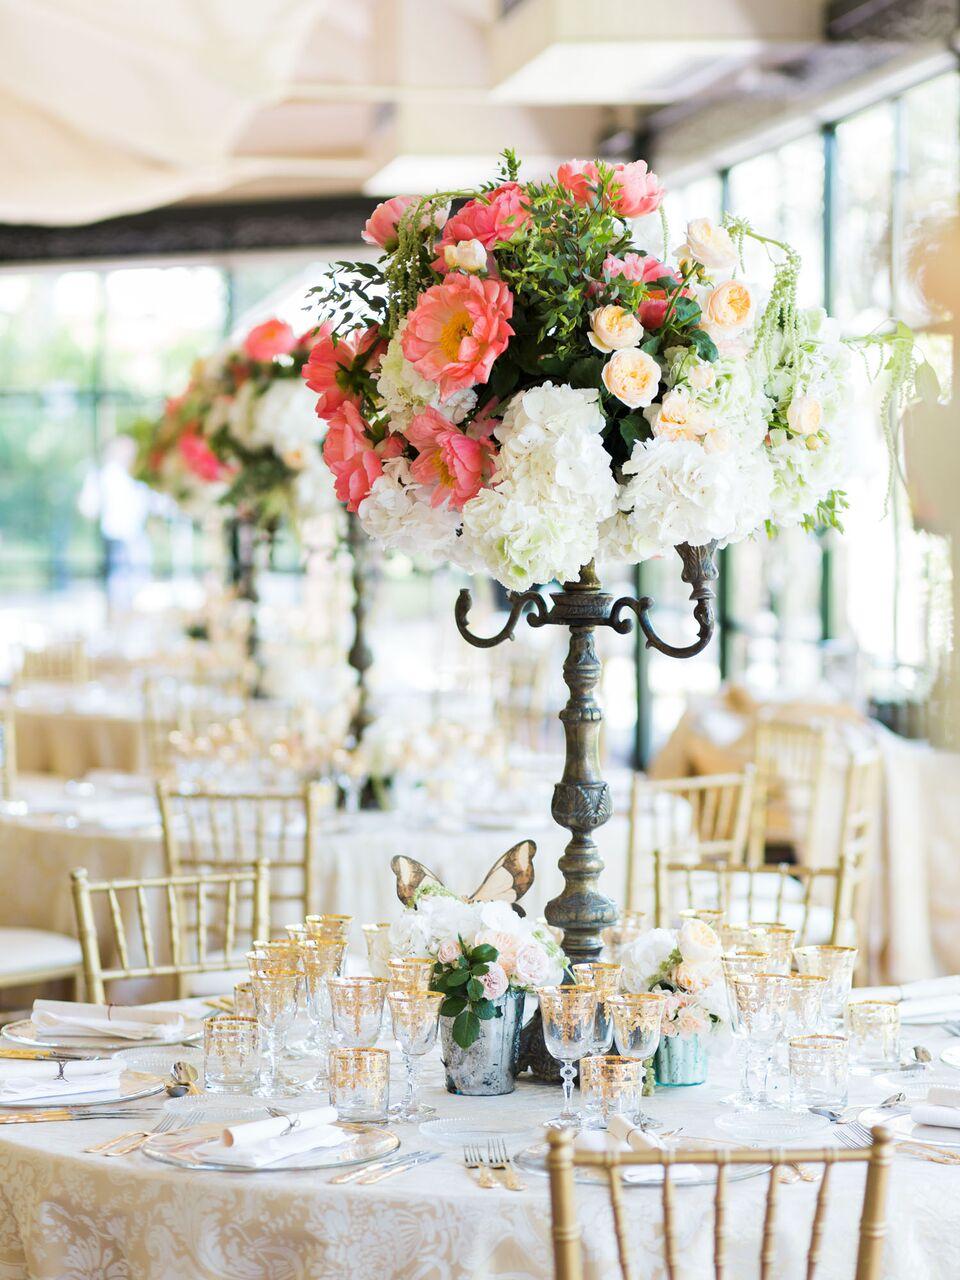 Si-Quiero-Wedding-Planner-By-Sira-Antequera-Paola-Pedro-6